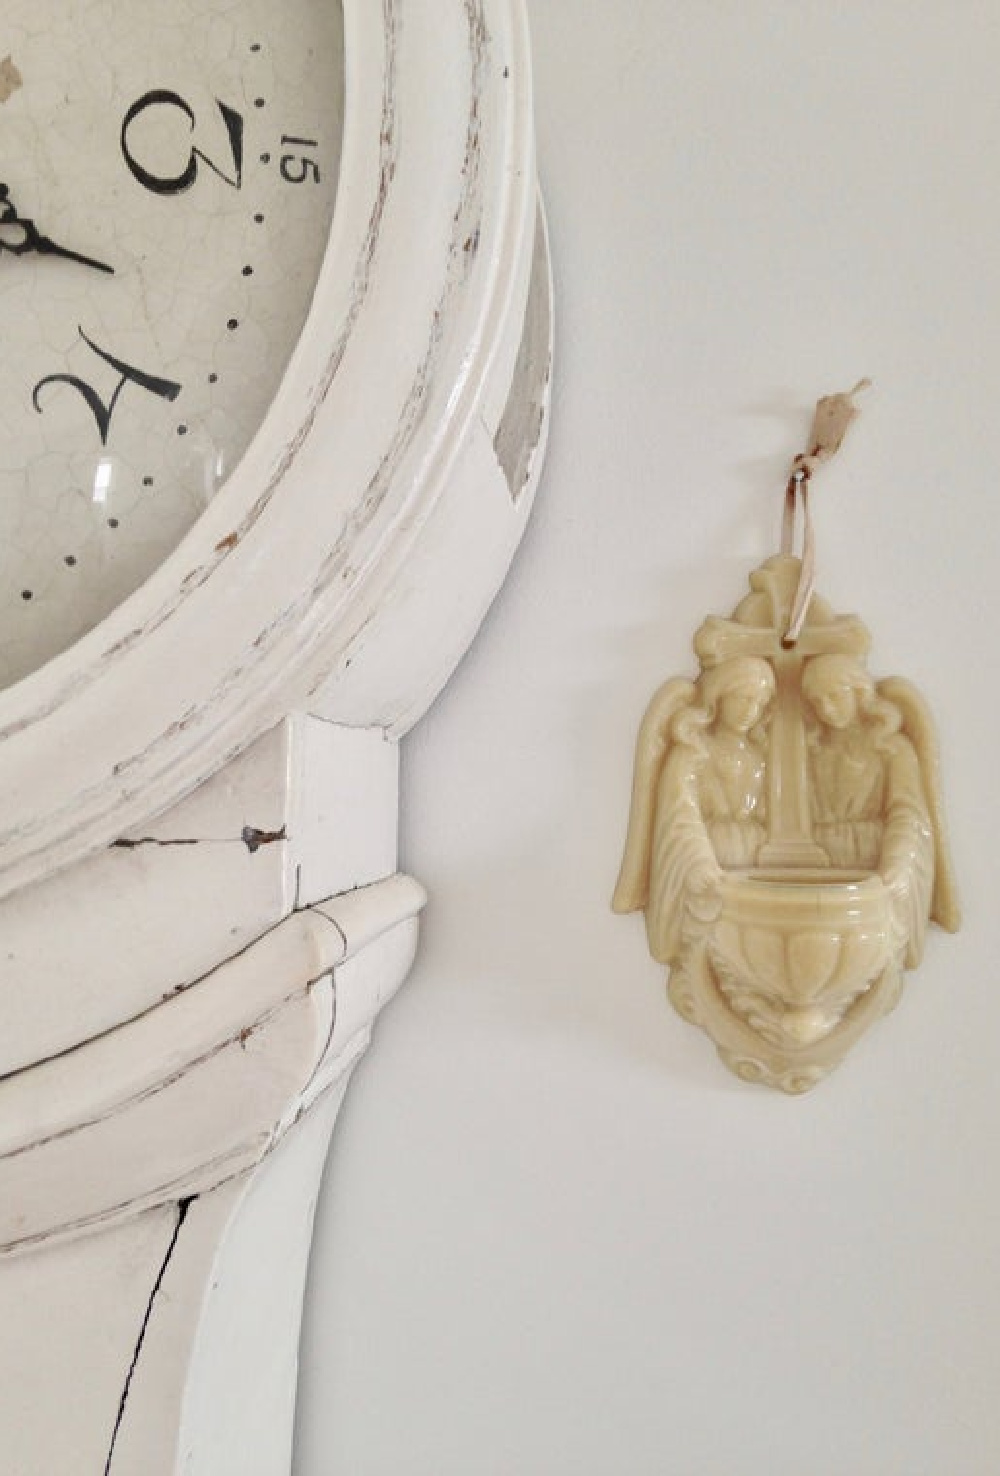 Antique French holy water font near white Swedish mora clock - My Petite Maison.